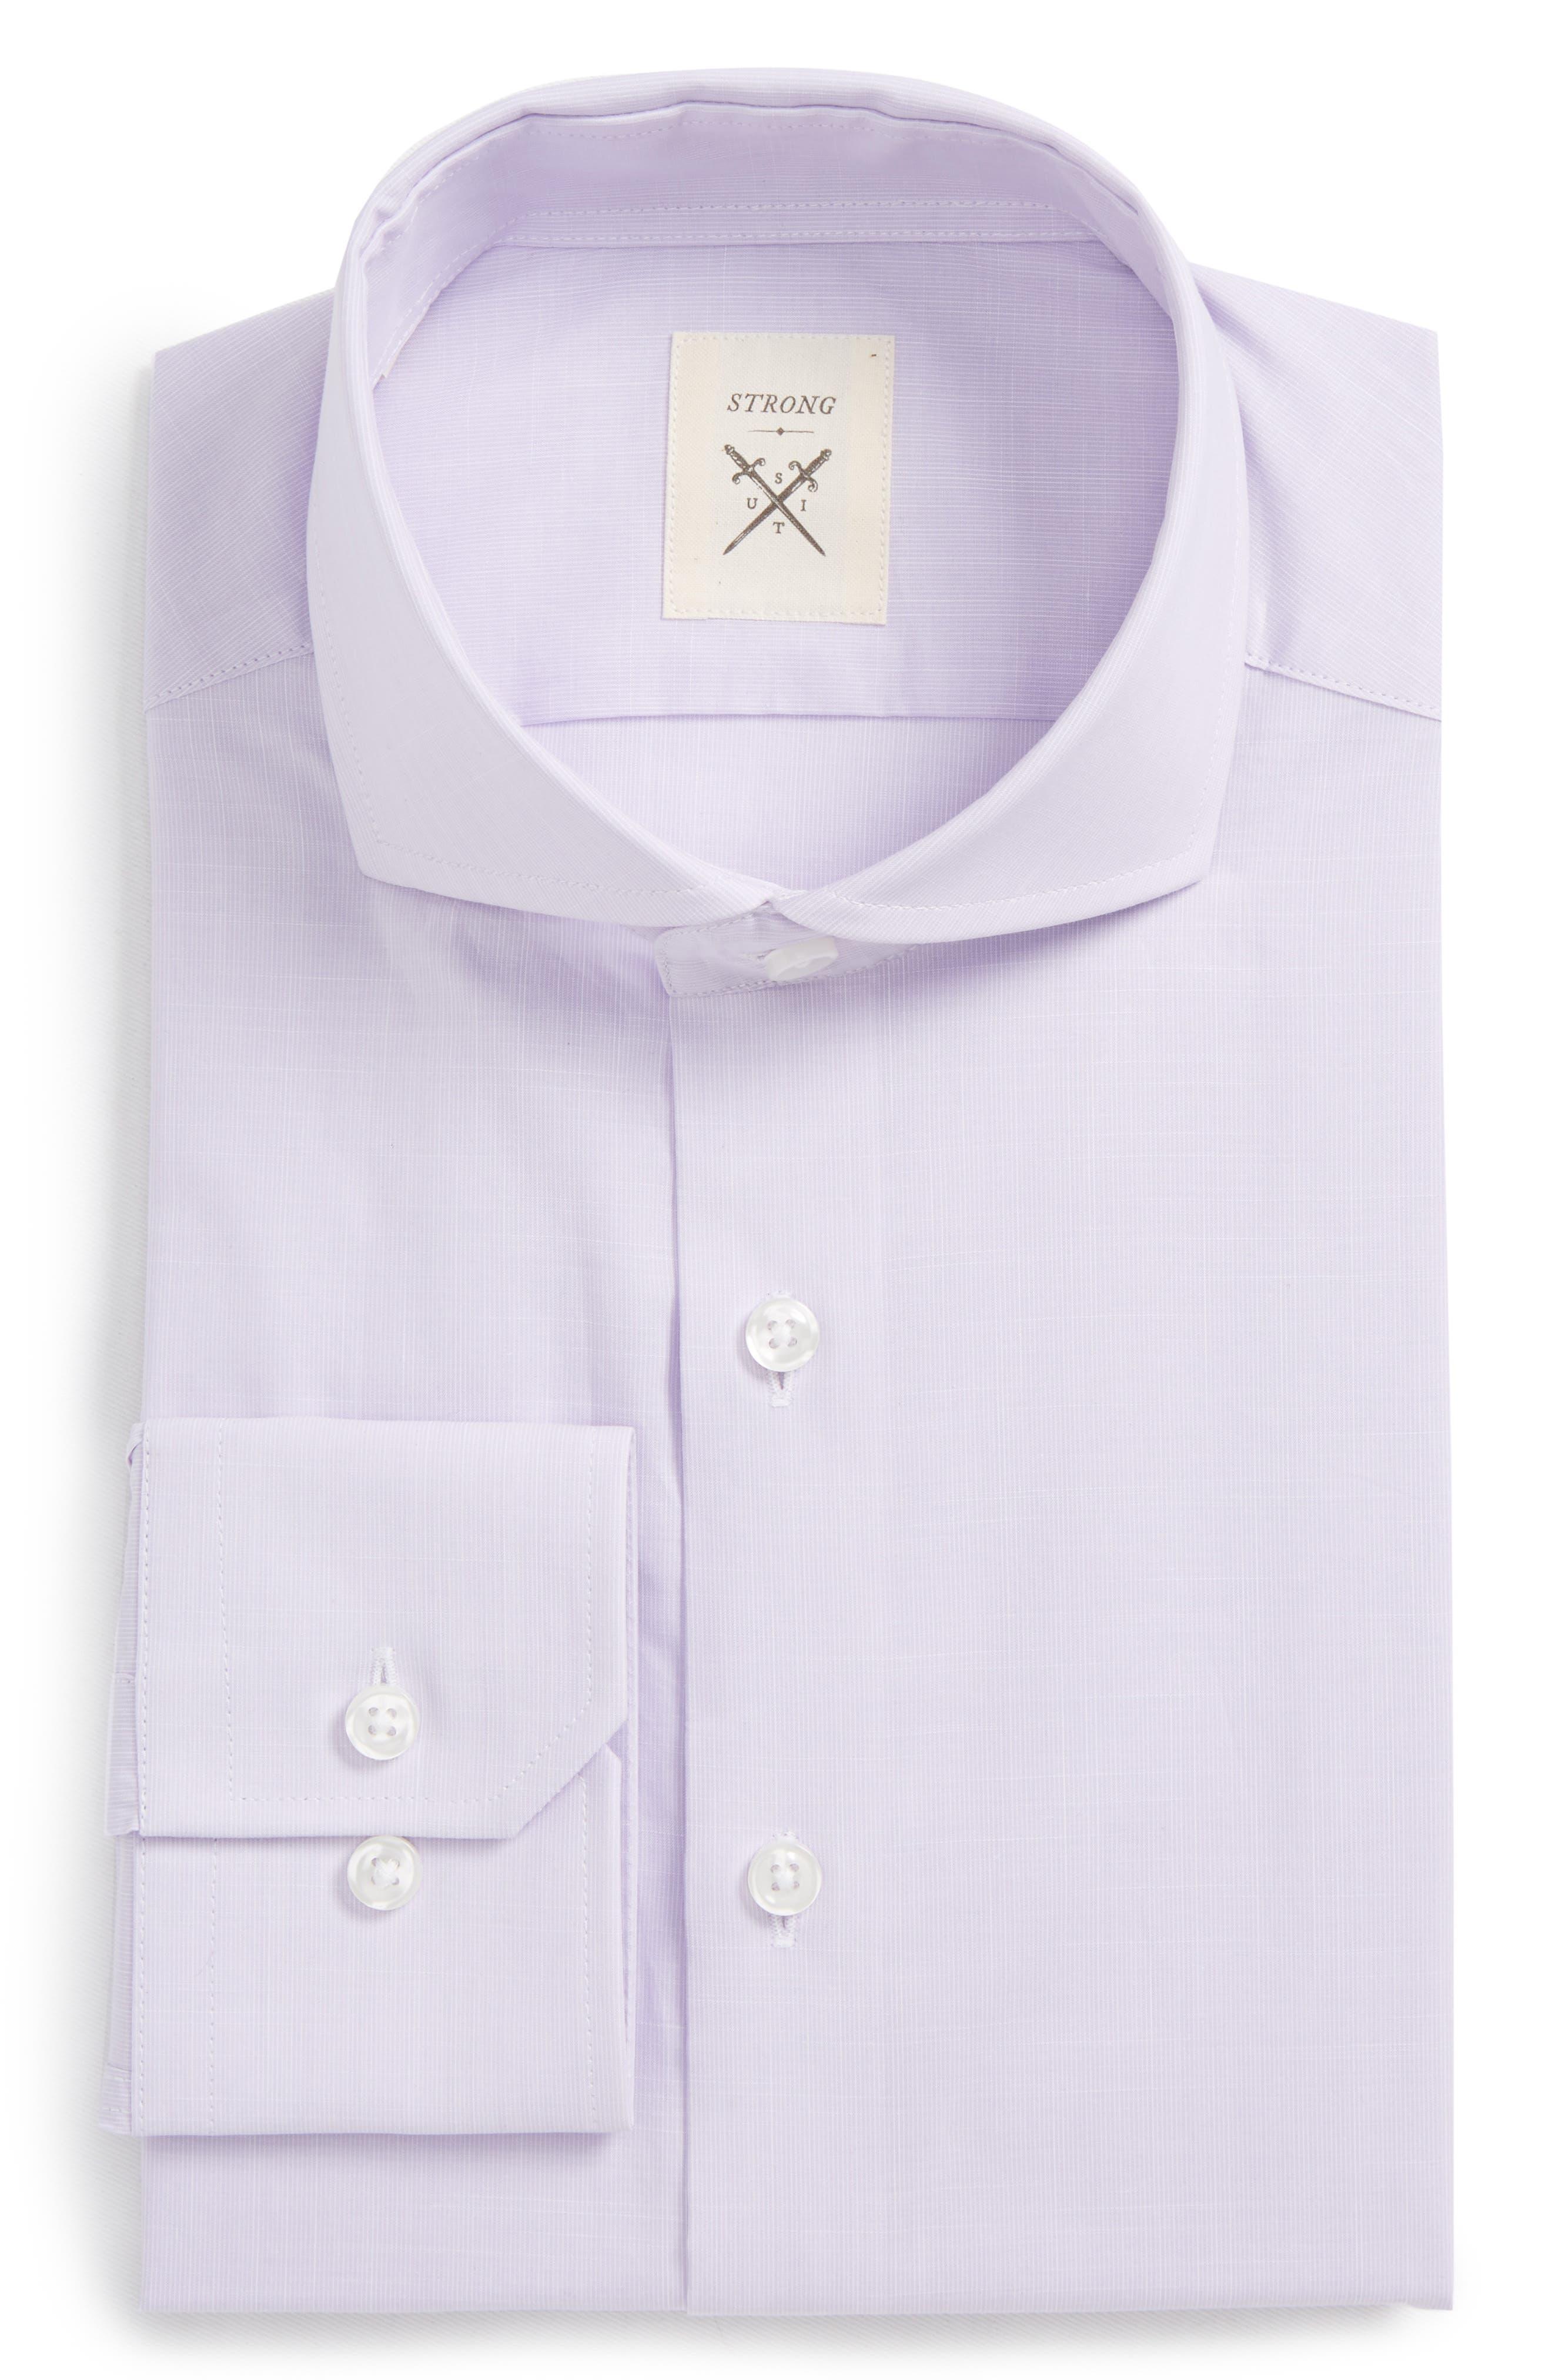 Espirit Trim Fit Solid Dress Shirt,                         Main,                         color, Lavender Solid